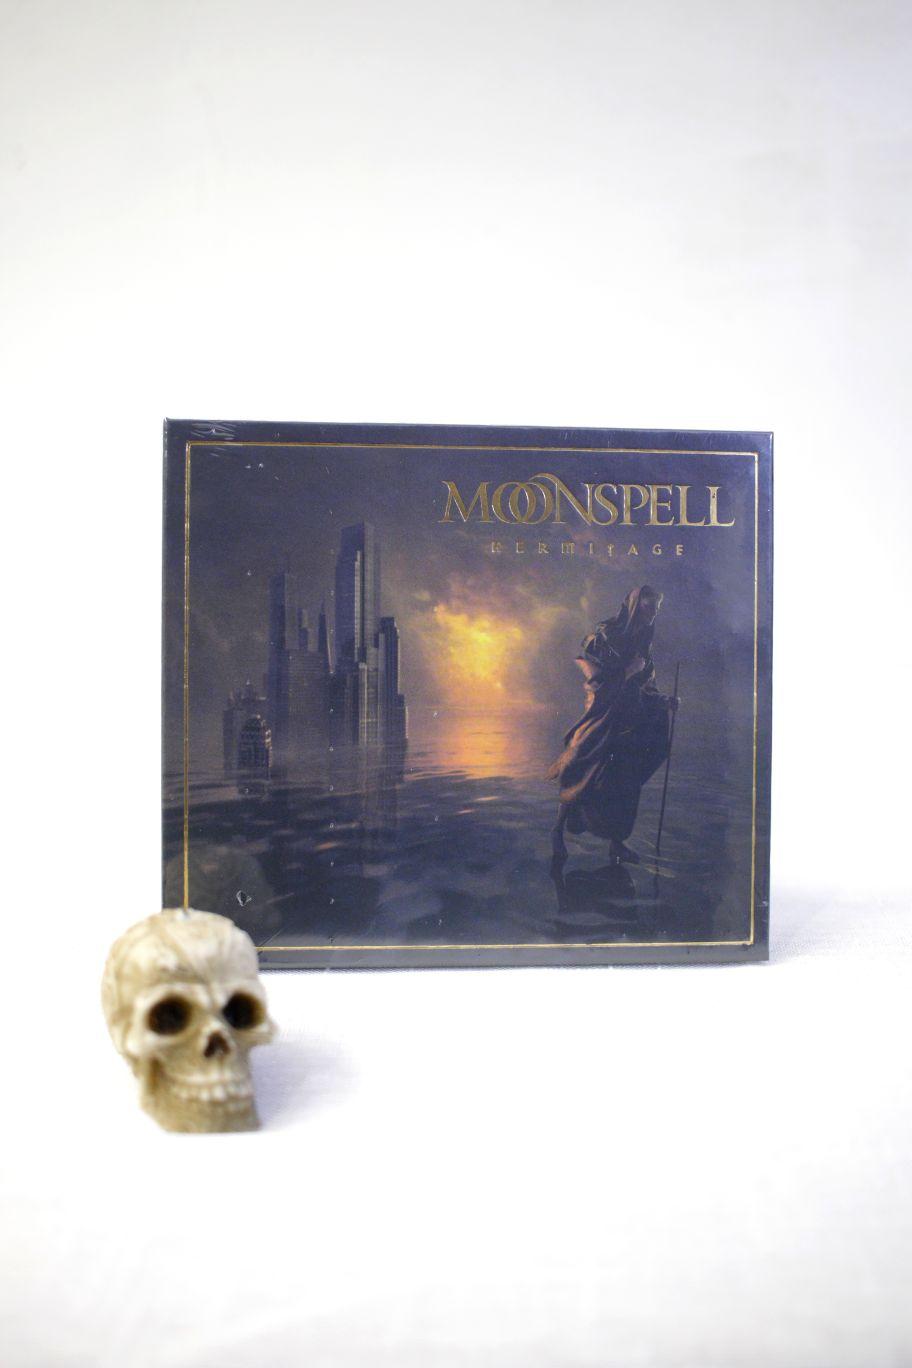 CD MOONSPELL HERMITAGE BOOK